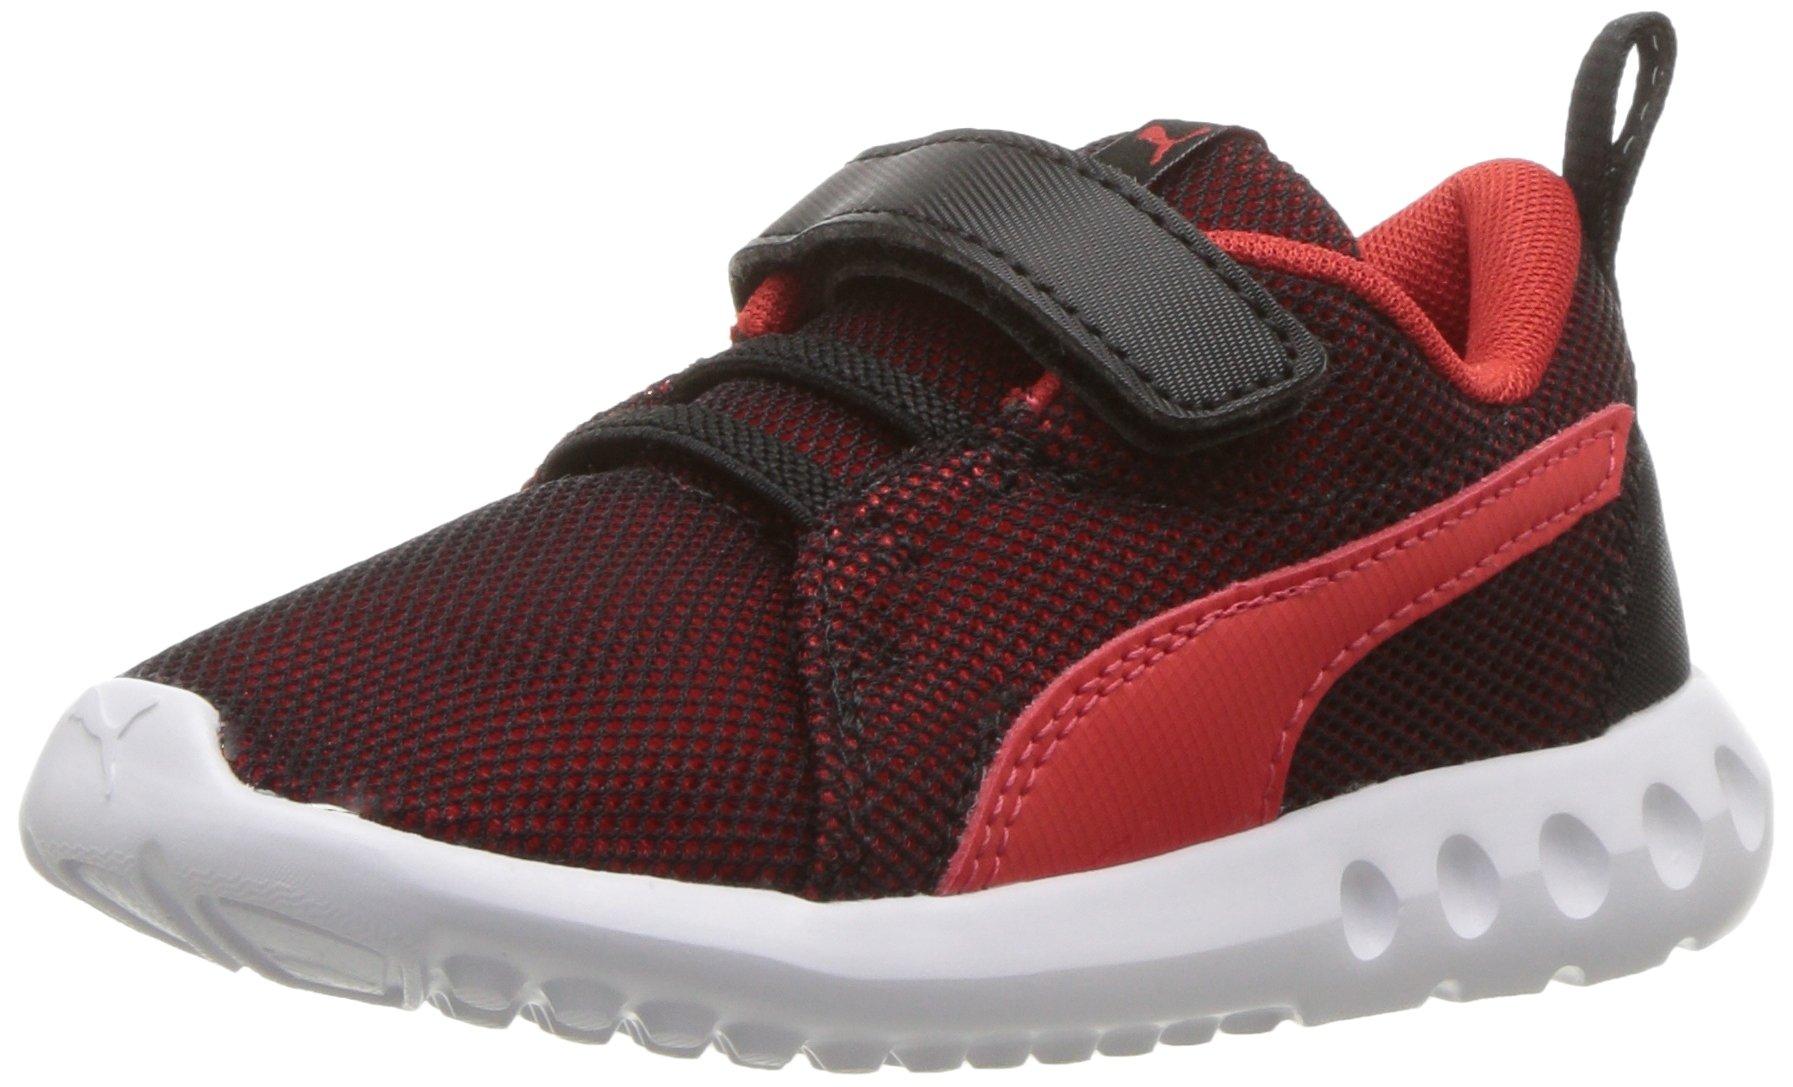 17db320c1c PUMA Baby Carson 2 Breathe Velcro Kids Sneaker, Black-Flame Scarlet, 10 M  US Toddler